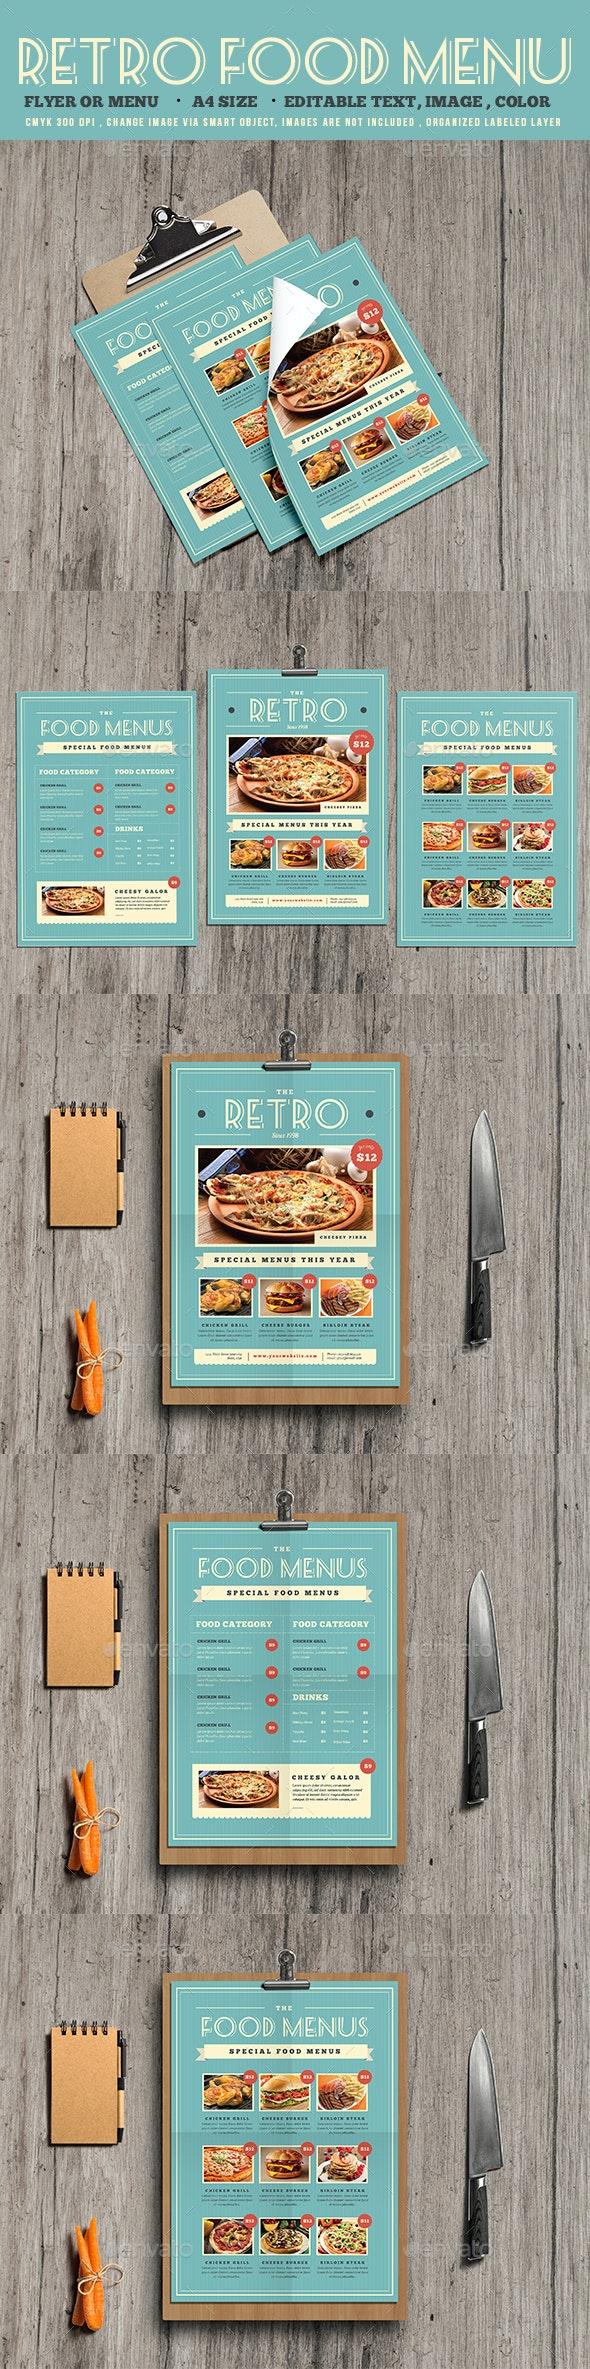 Retro Food Menu Flyer - Restaurant Flyers